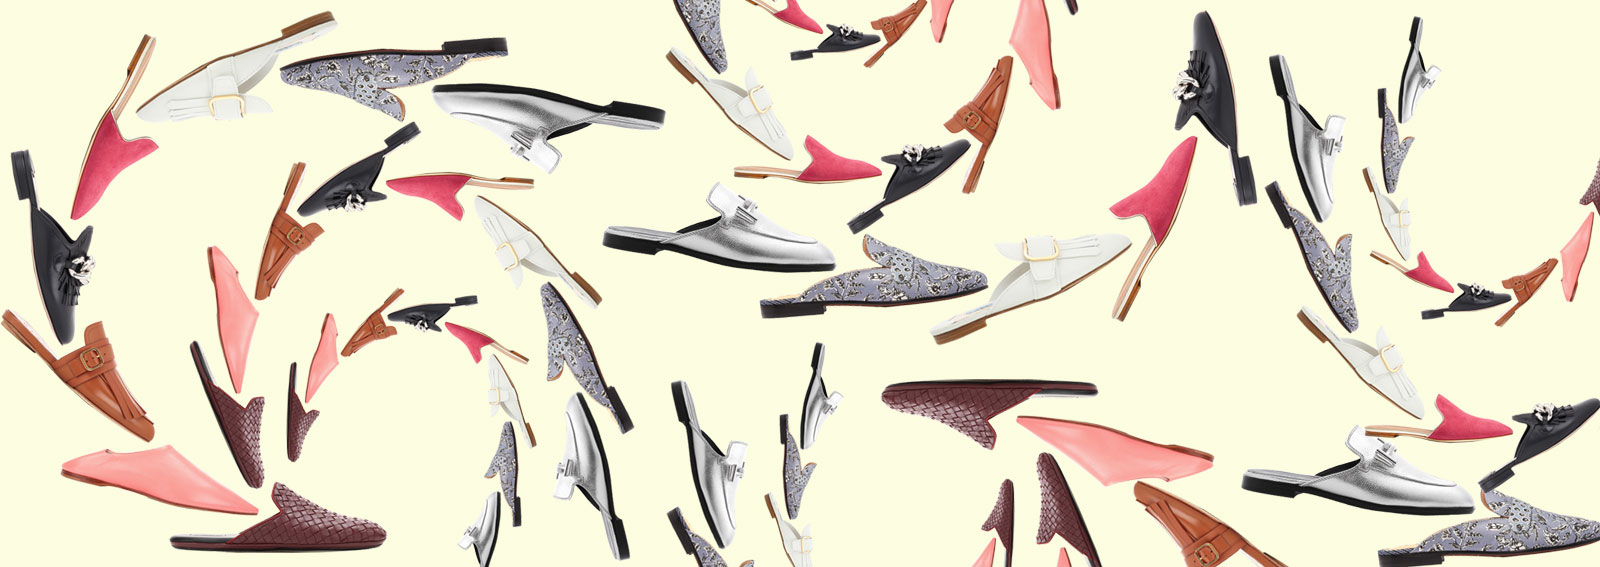 DESKTOP_slippers